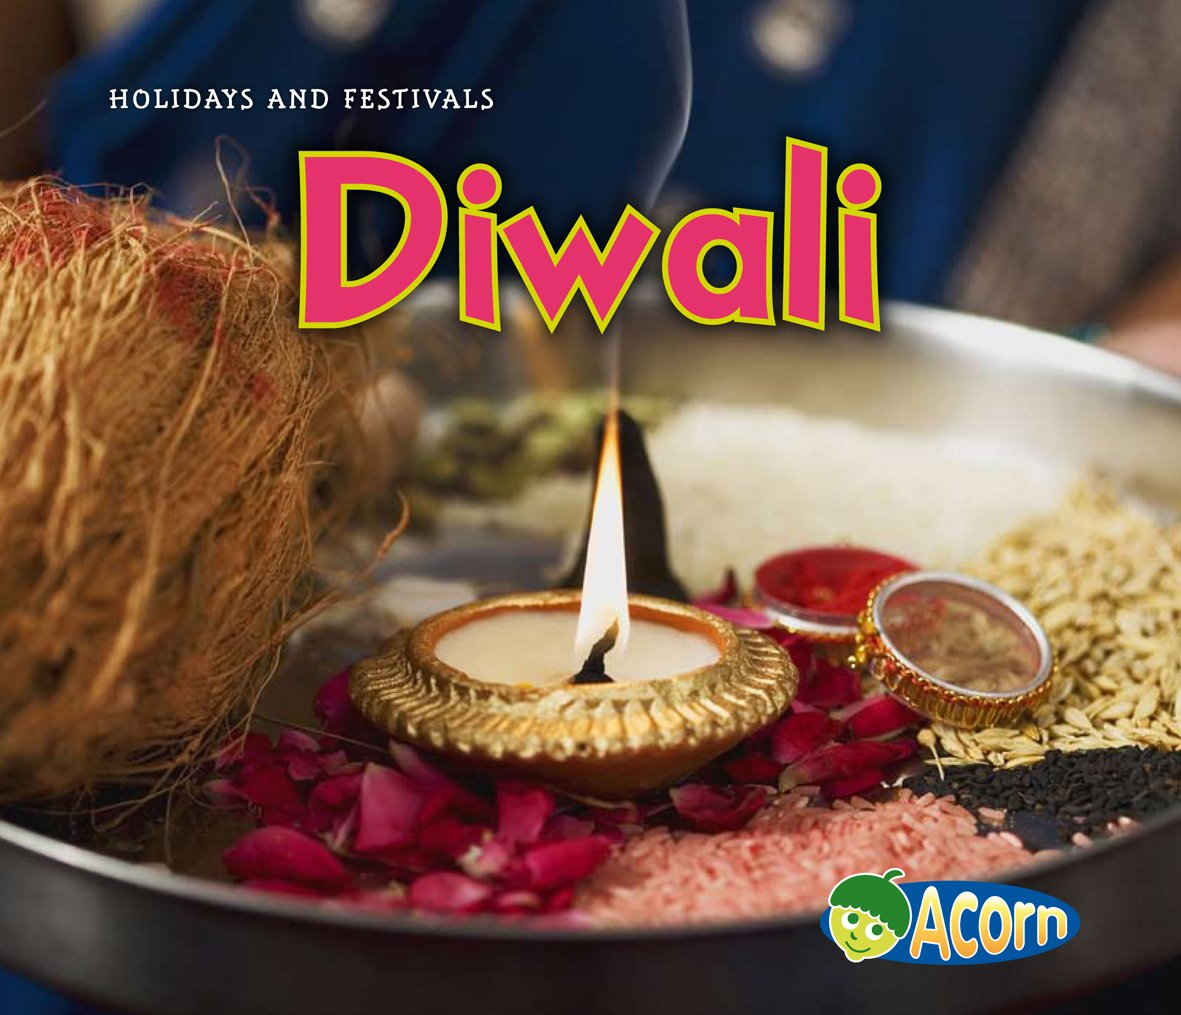 Diwali (Holidays and Festivals)